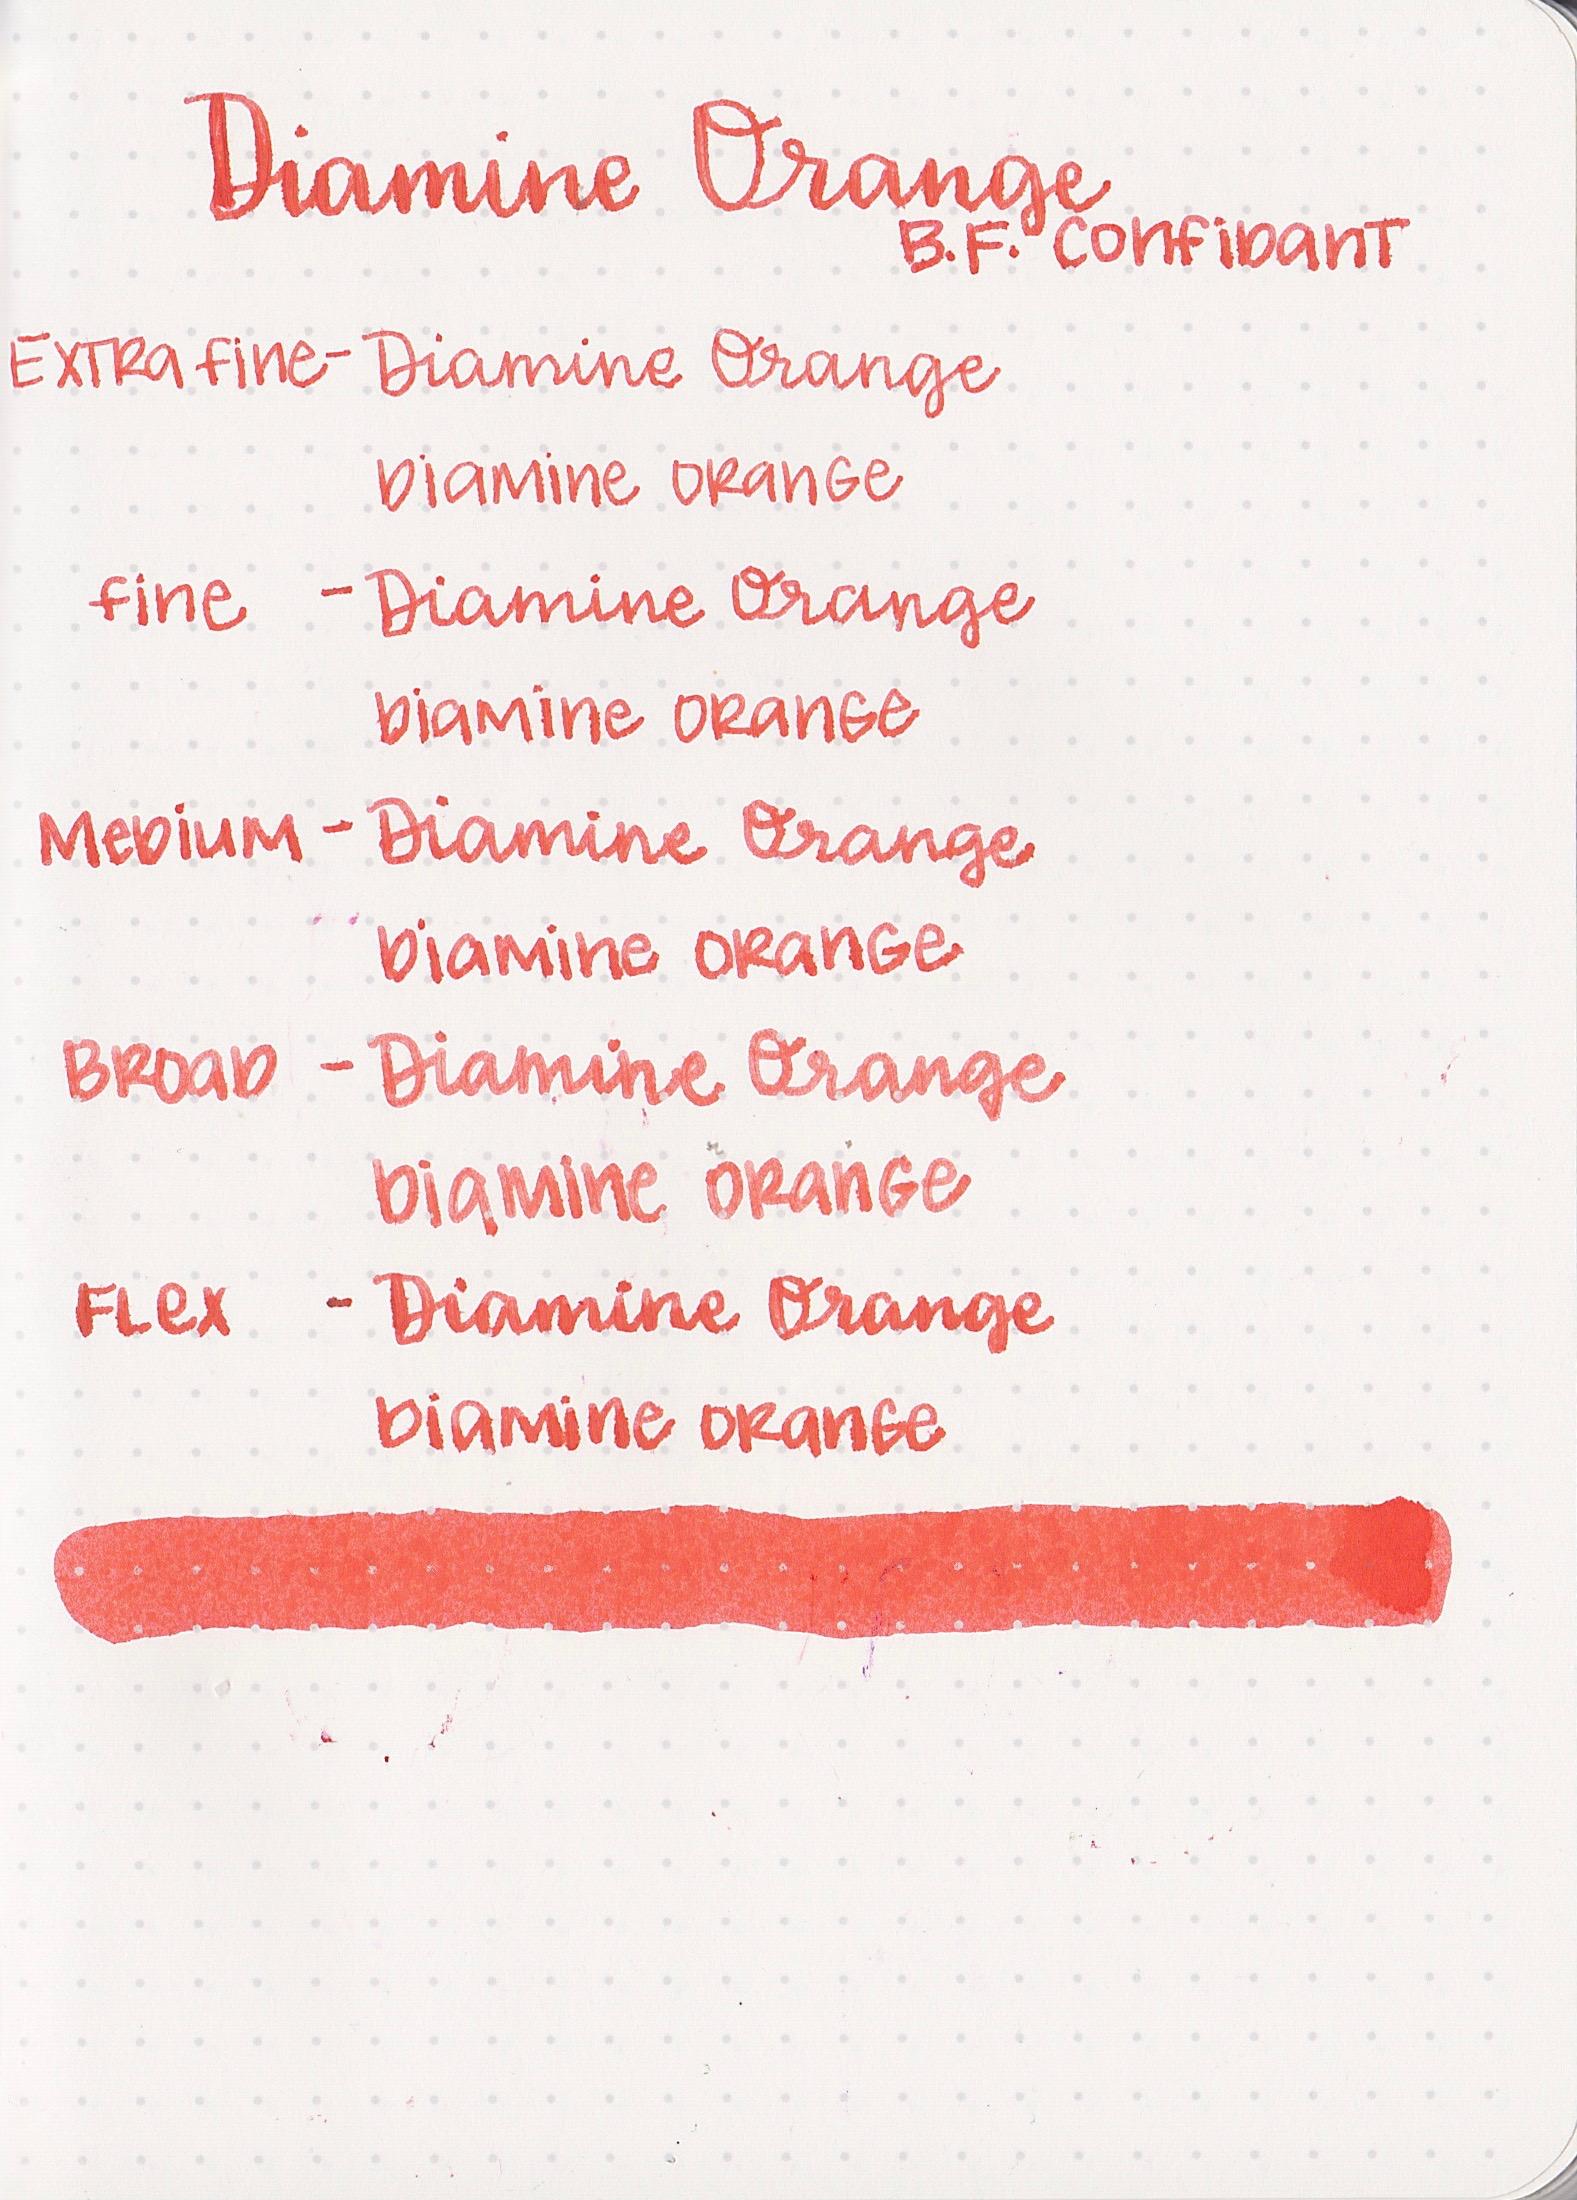 DiamineOrange - 13.jpg